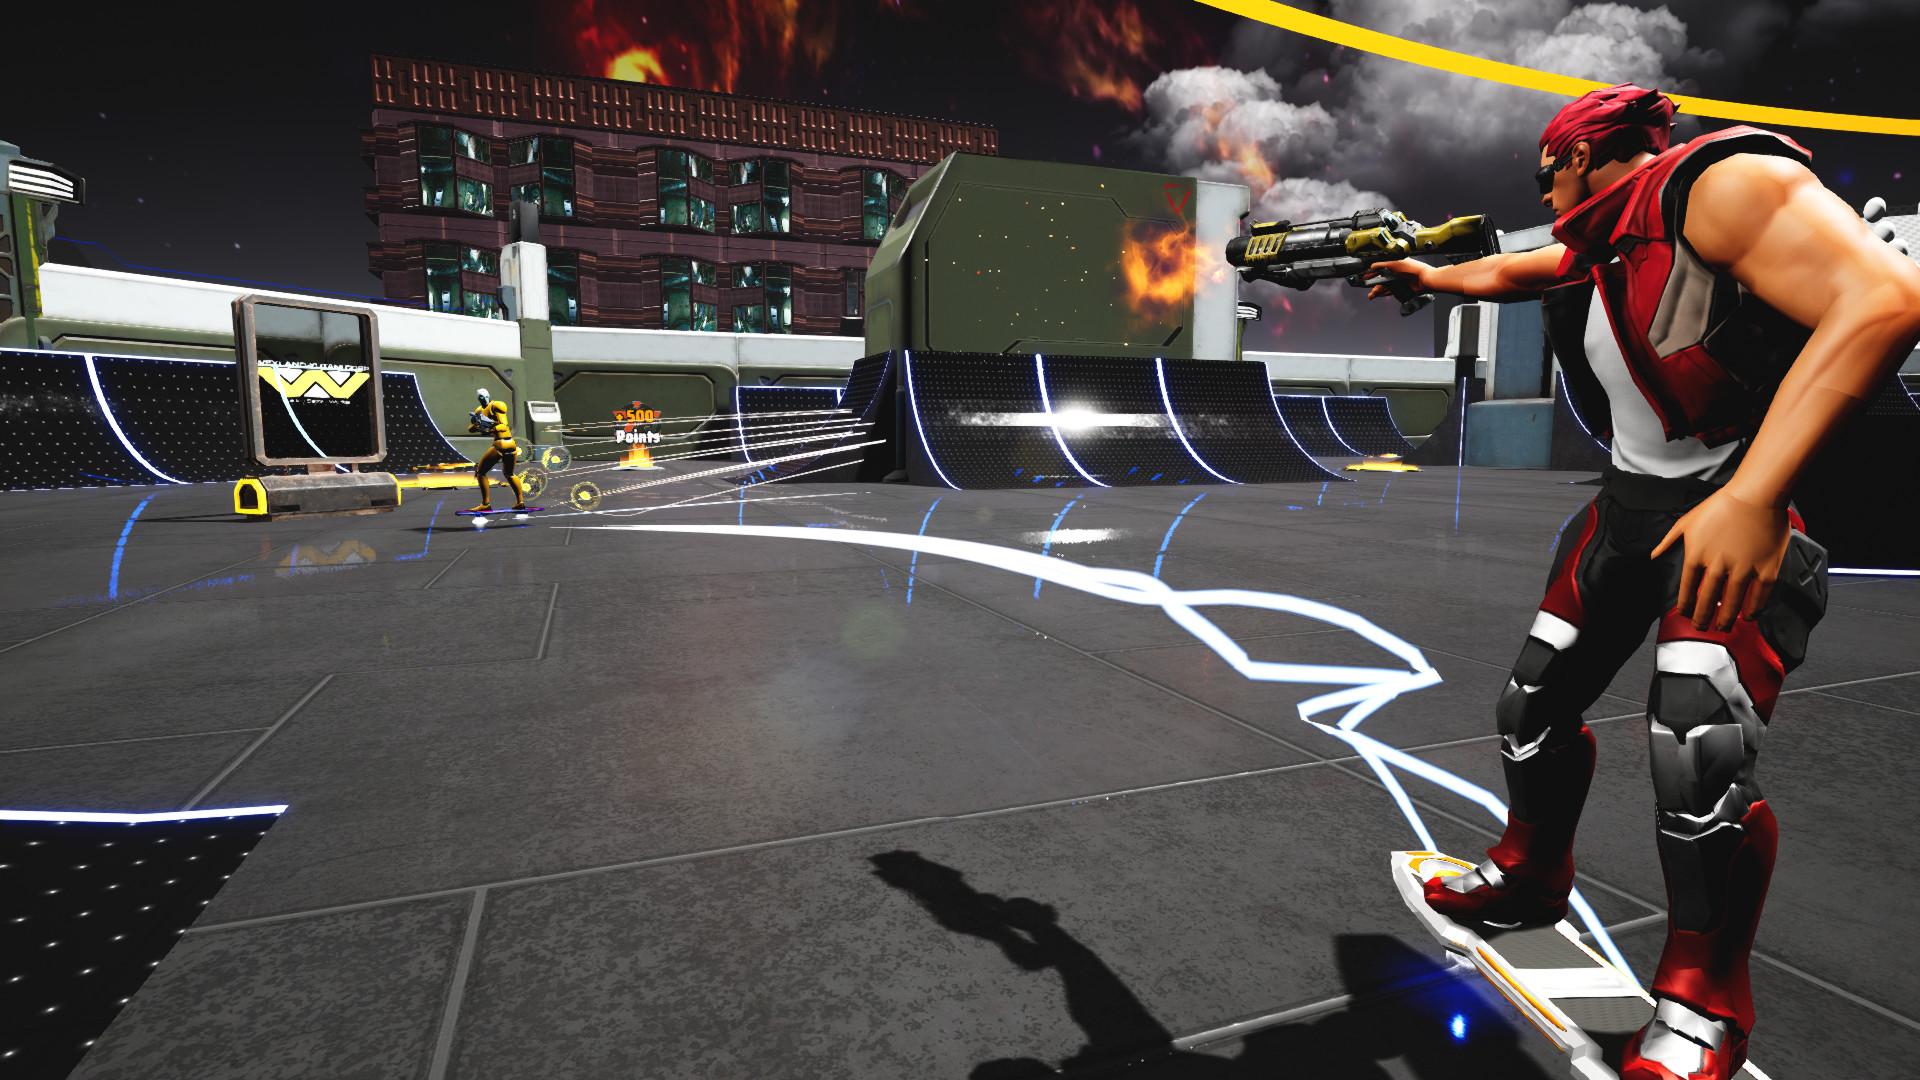 另类射击游戏《TrickShot》试玩Demo现已上线 2022年发售